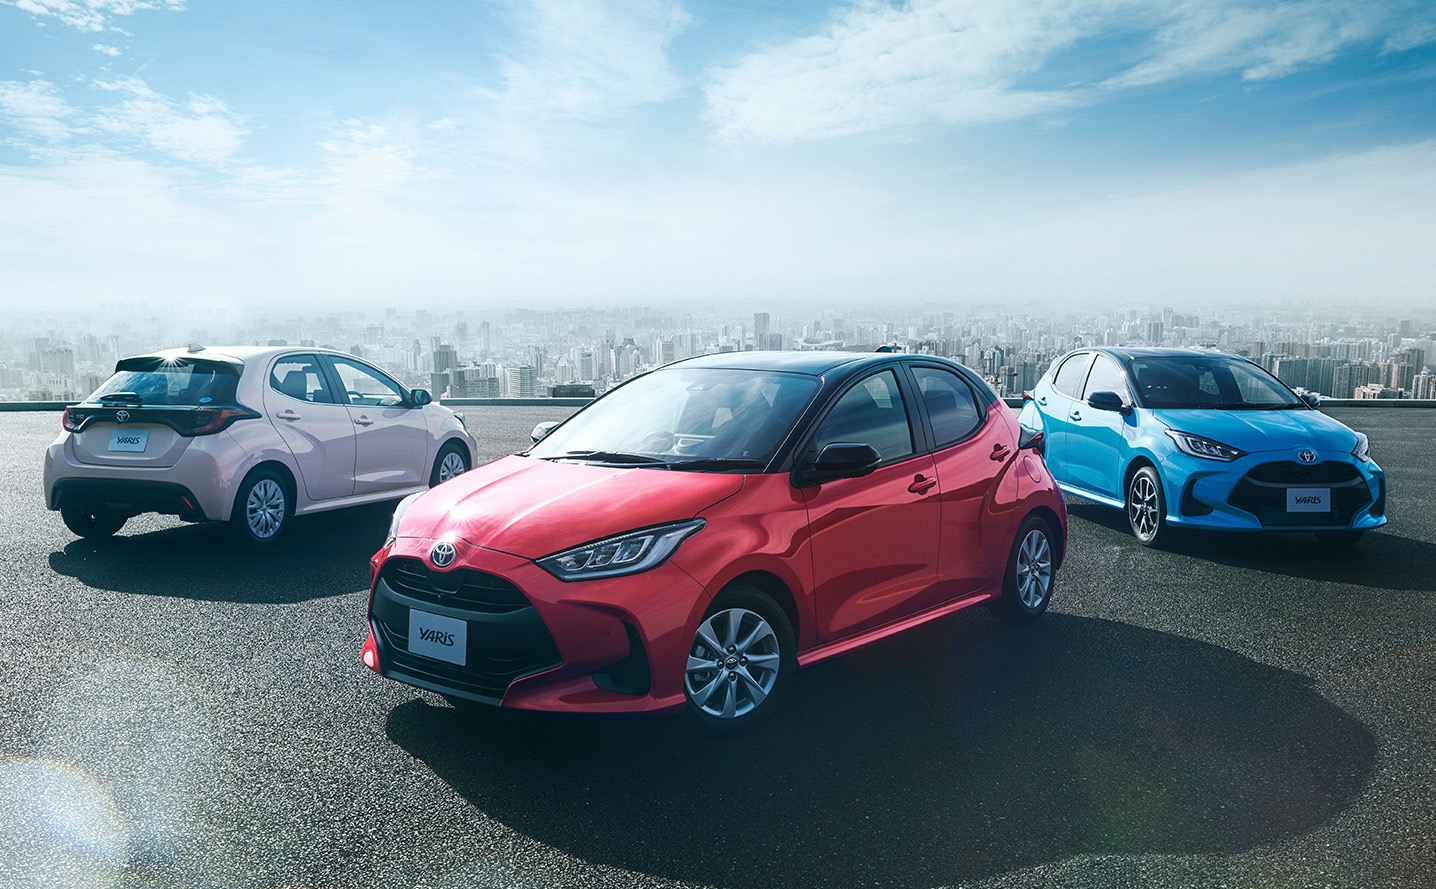 2020 Toyota Yaris Hybrid On Sale In Australia In May 3 3l 100km Performancedrive